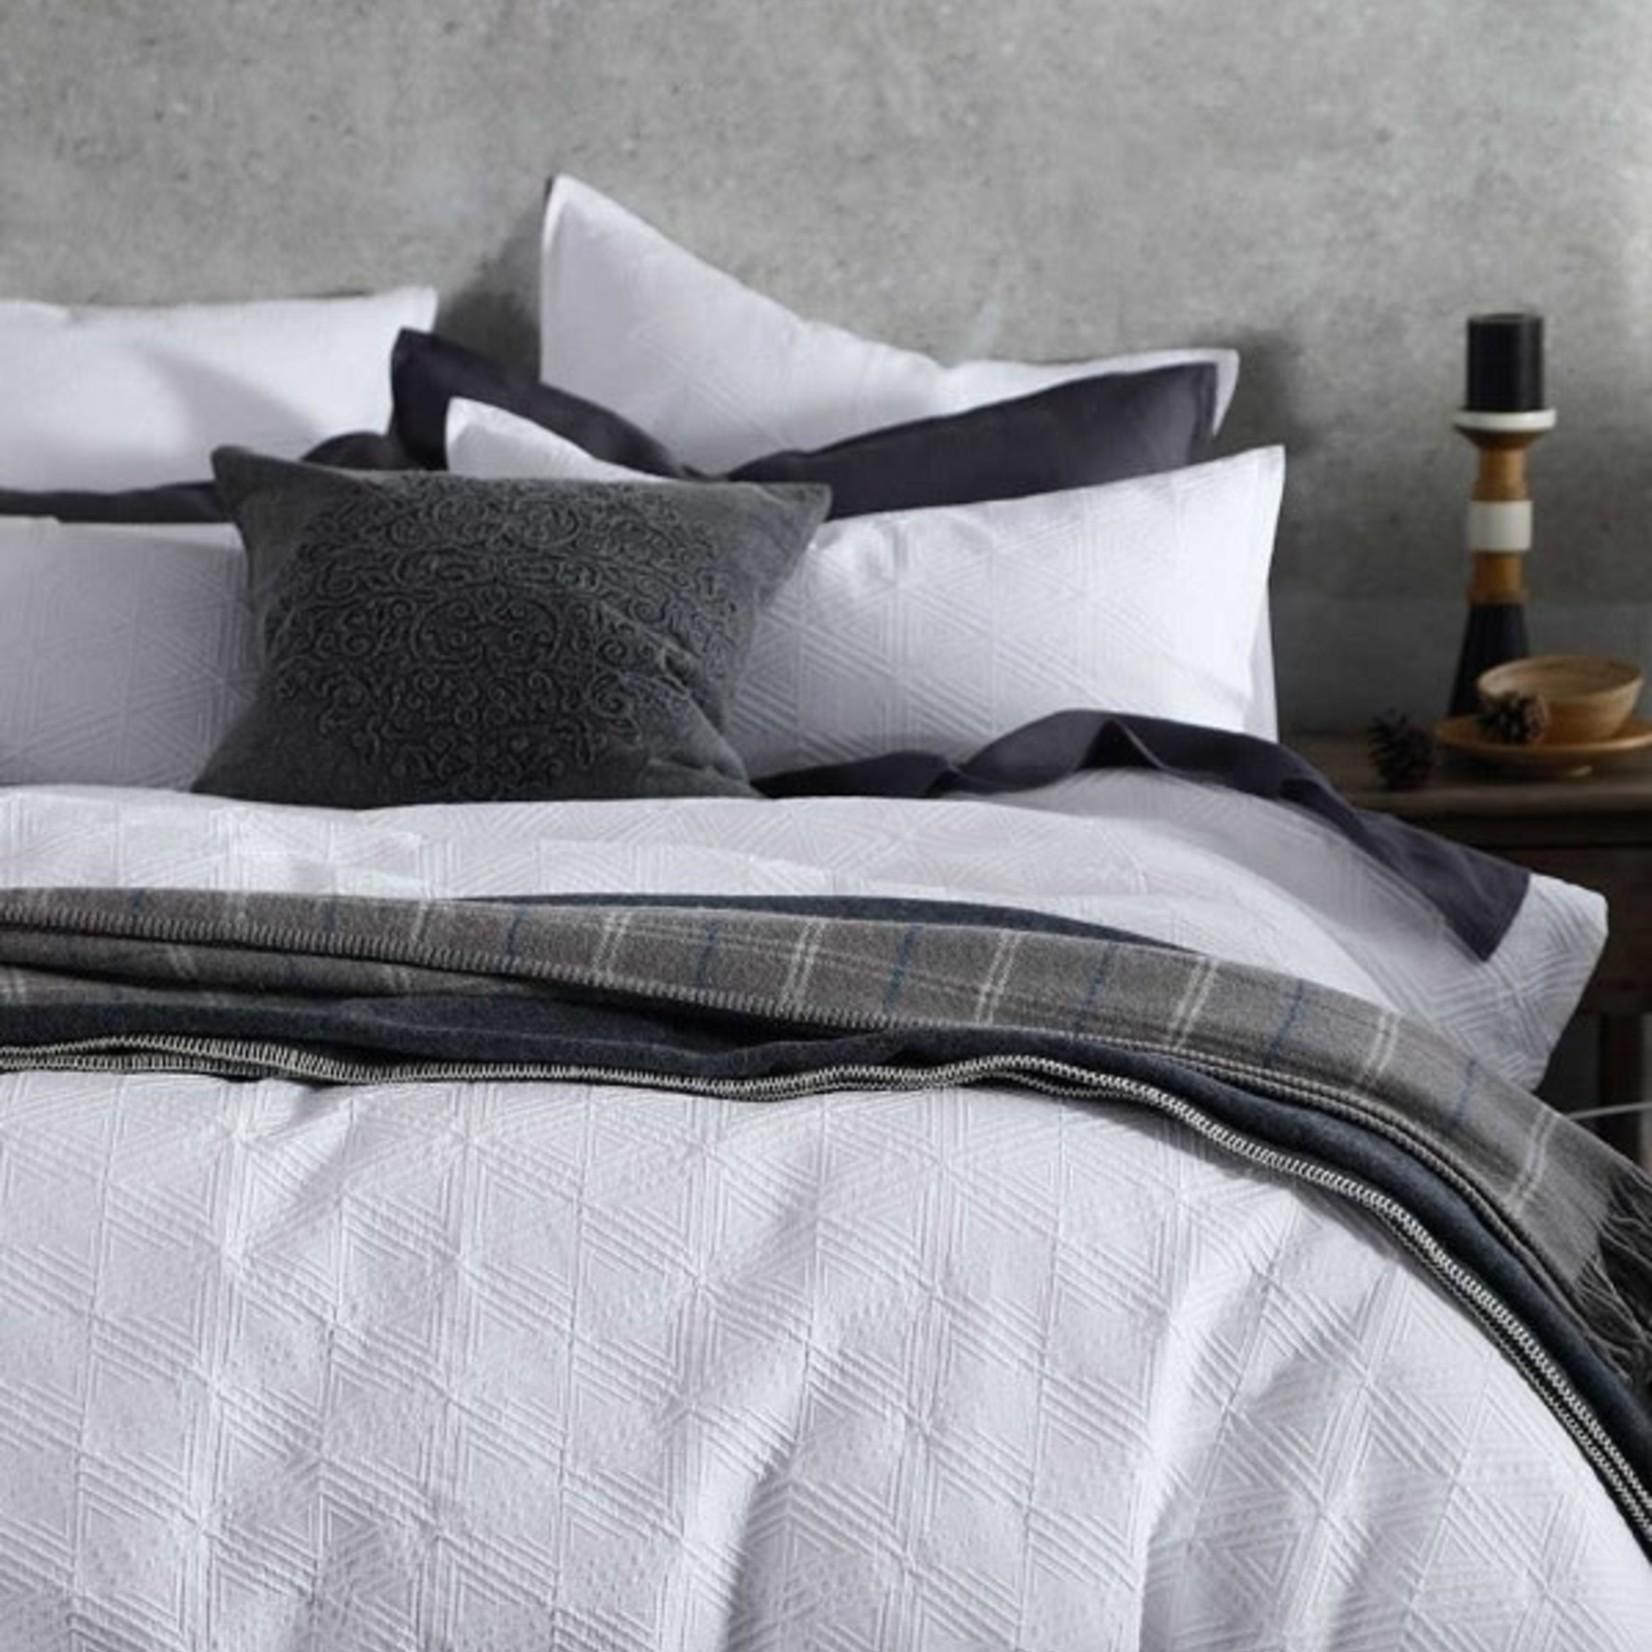 MM Linens TAIKA Oxford Pillowcover Set